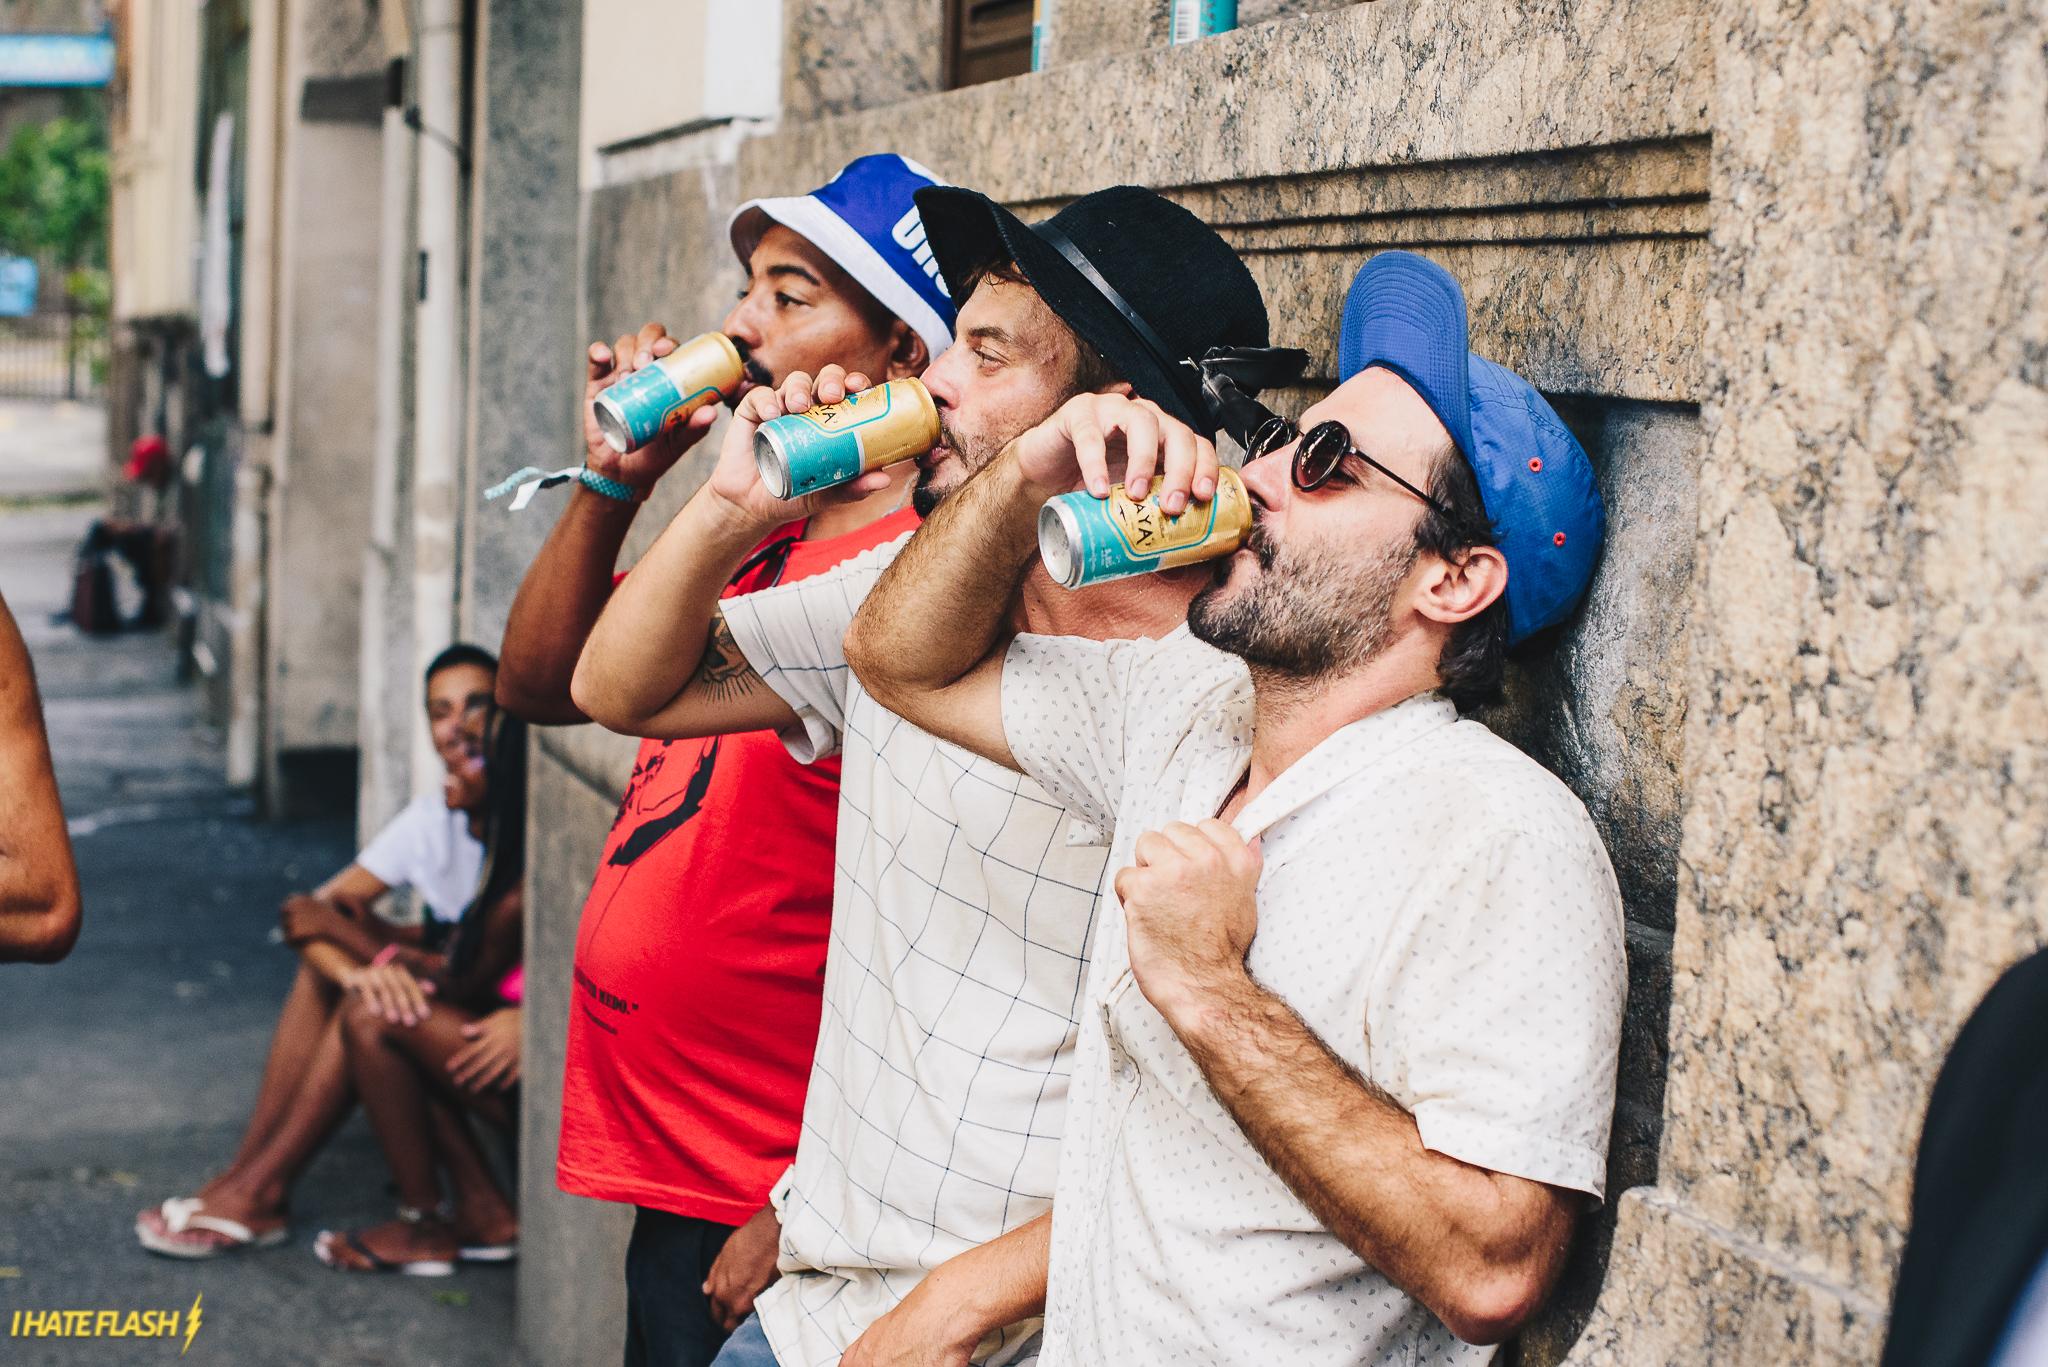 PRAYA APRESENTA: rato BranKo + Baile Bloko